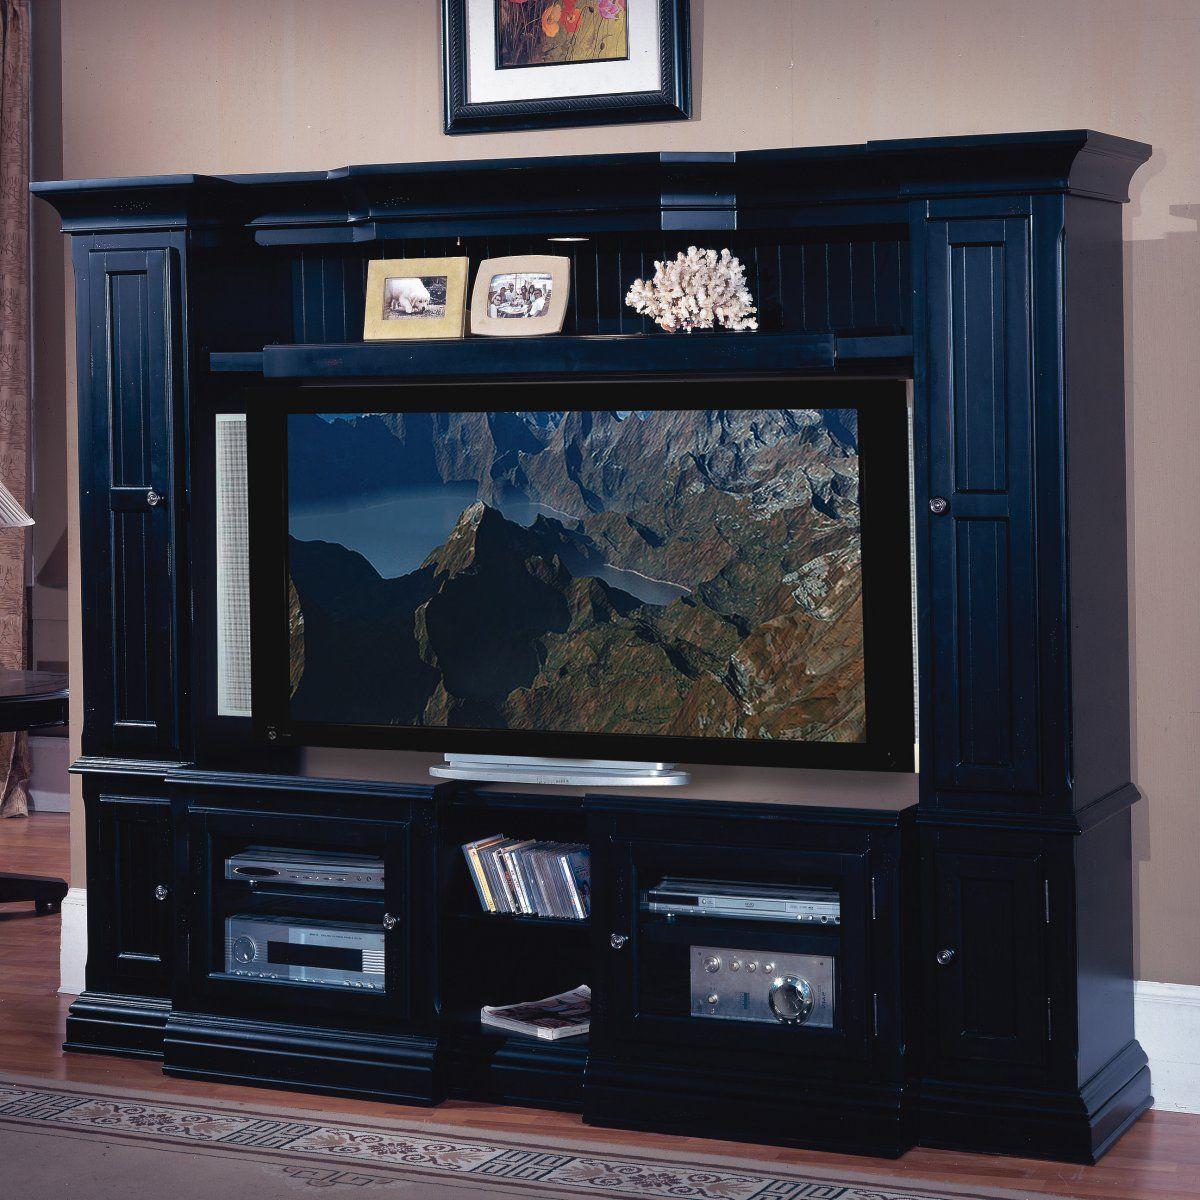 Home Entertainment Spaces: Parker House Country Creek Expandable Space Saver Entertainment Center